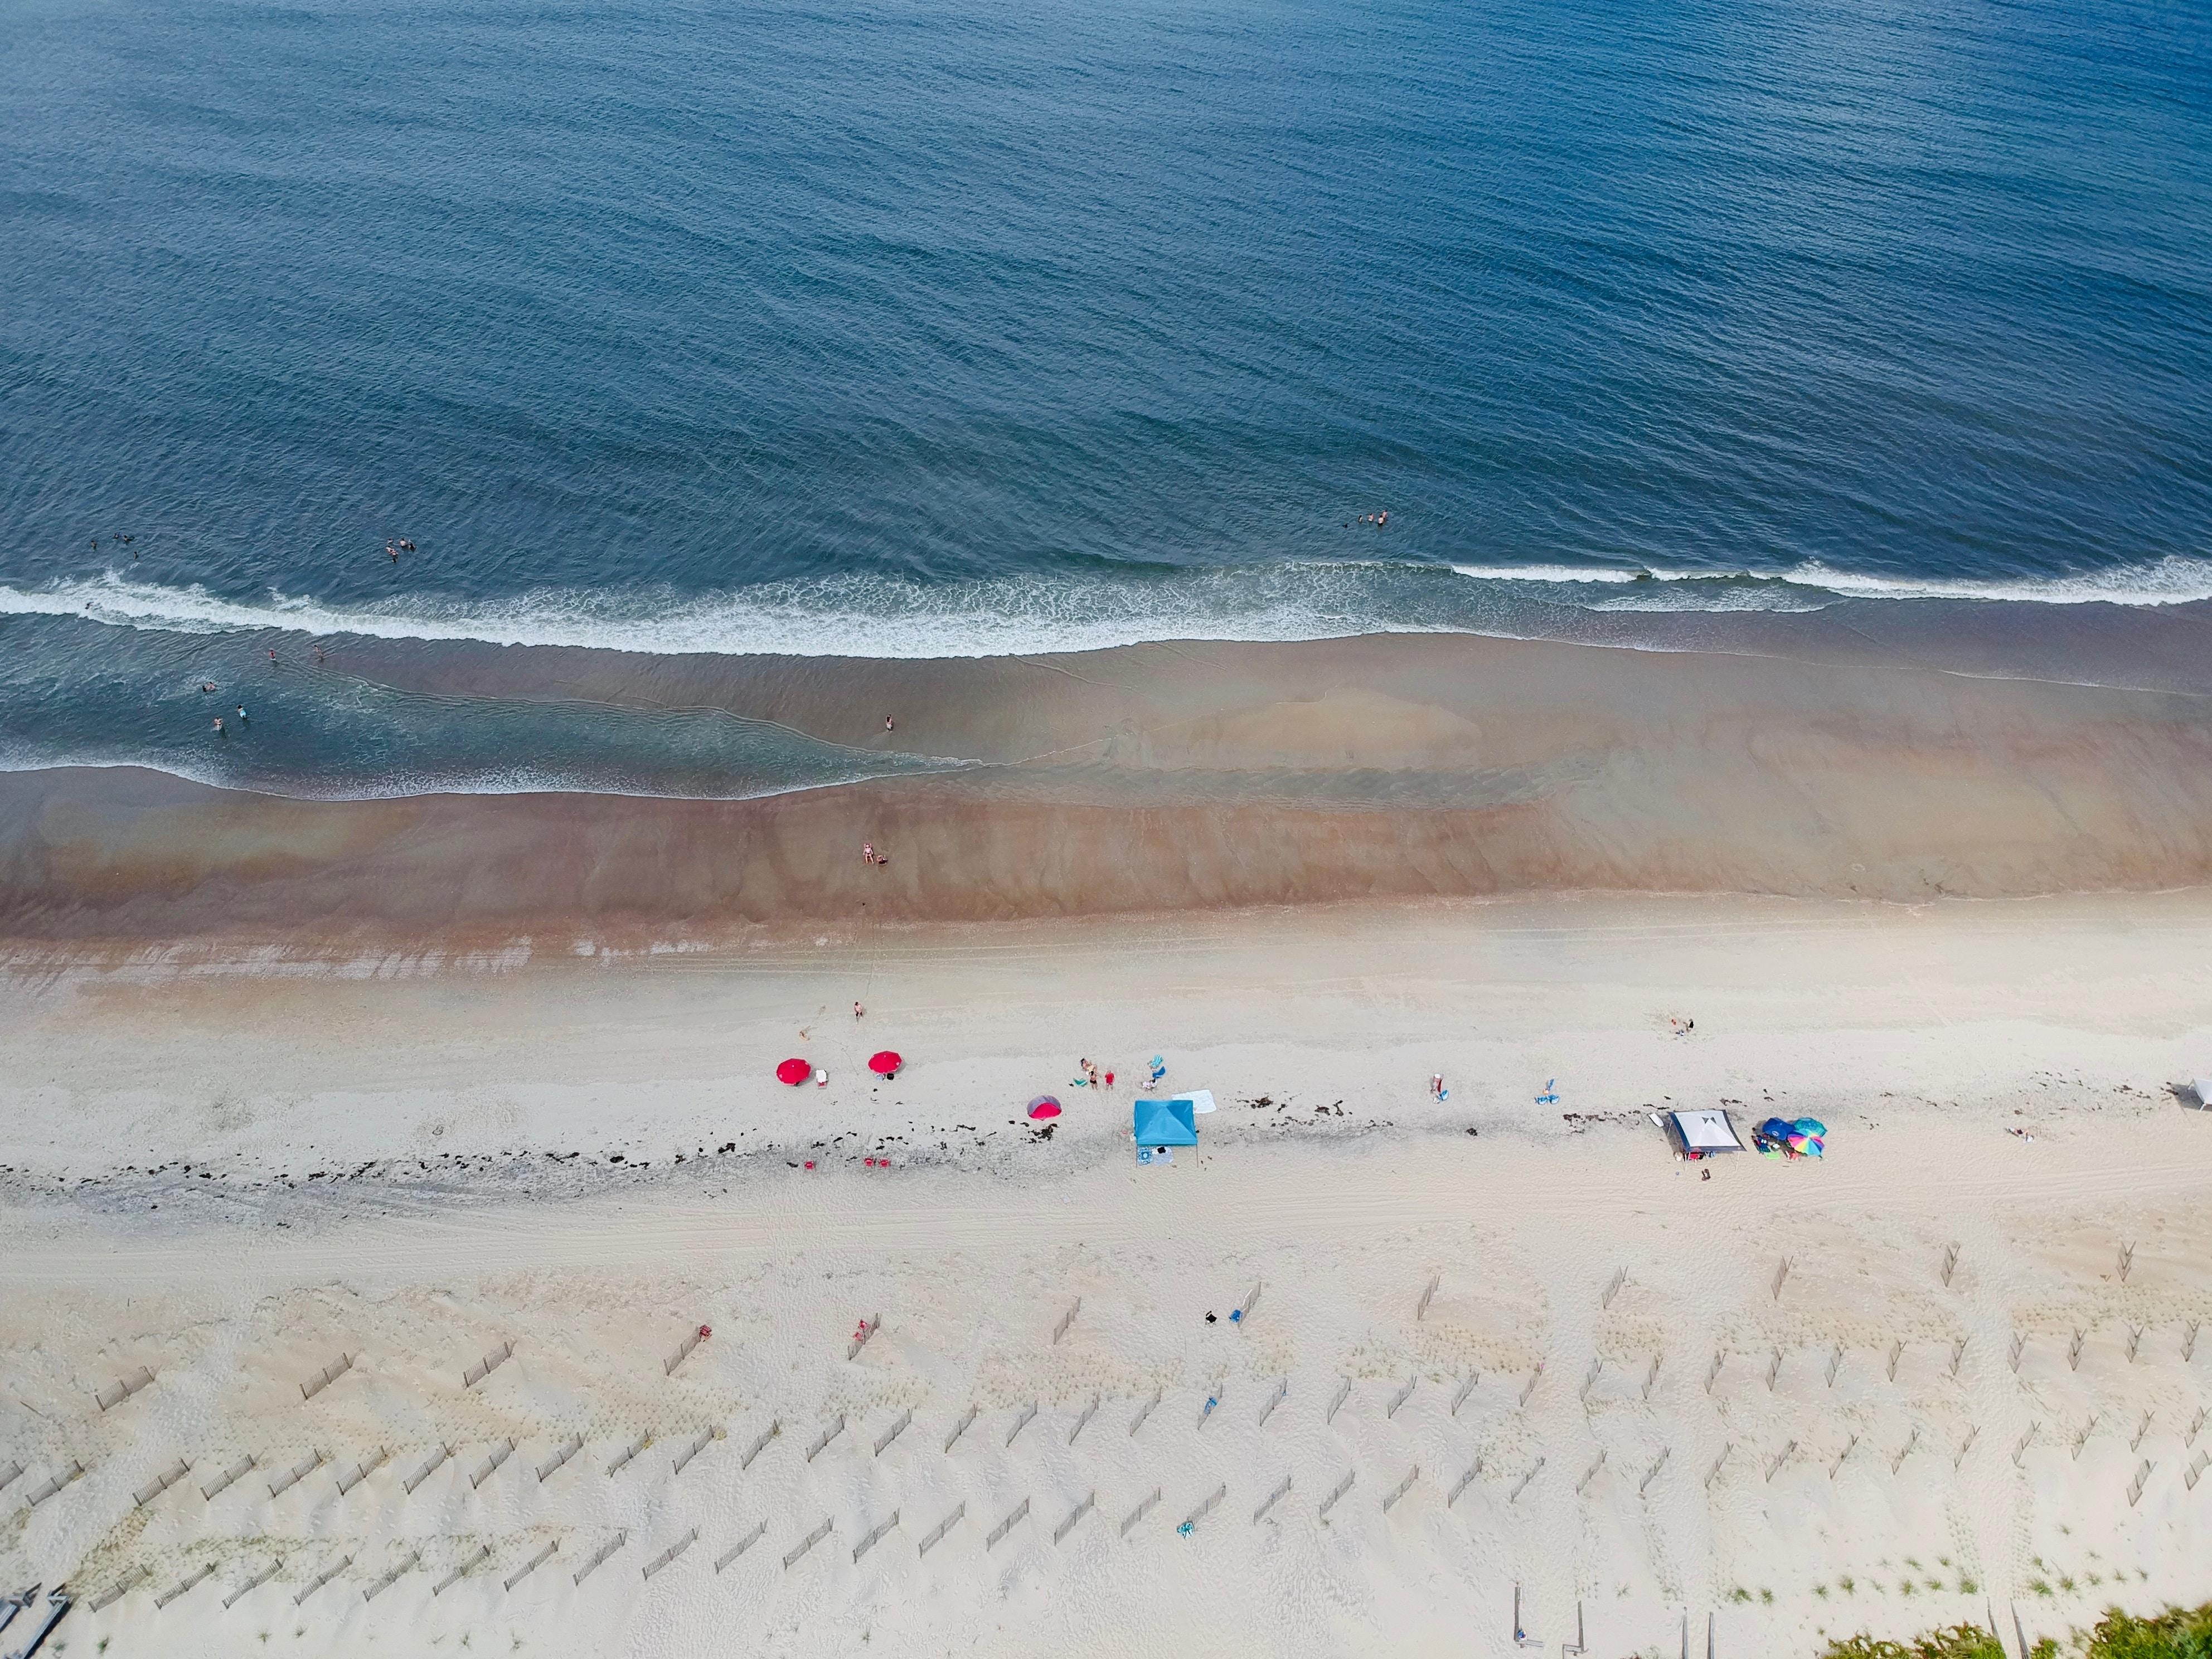 red beach umbrellas on beach